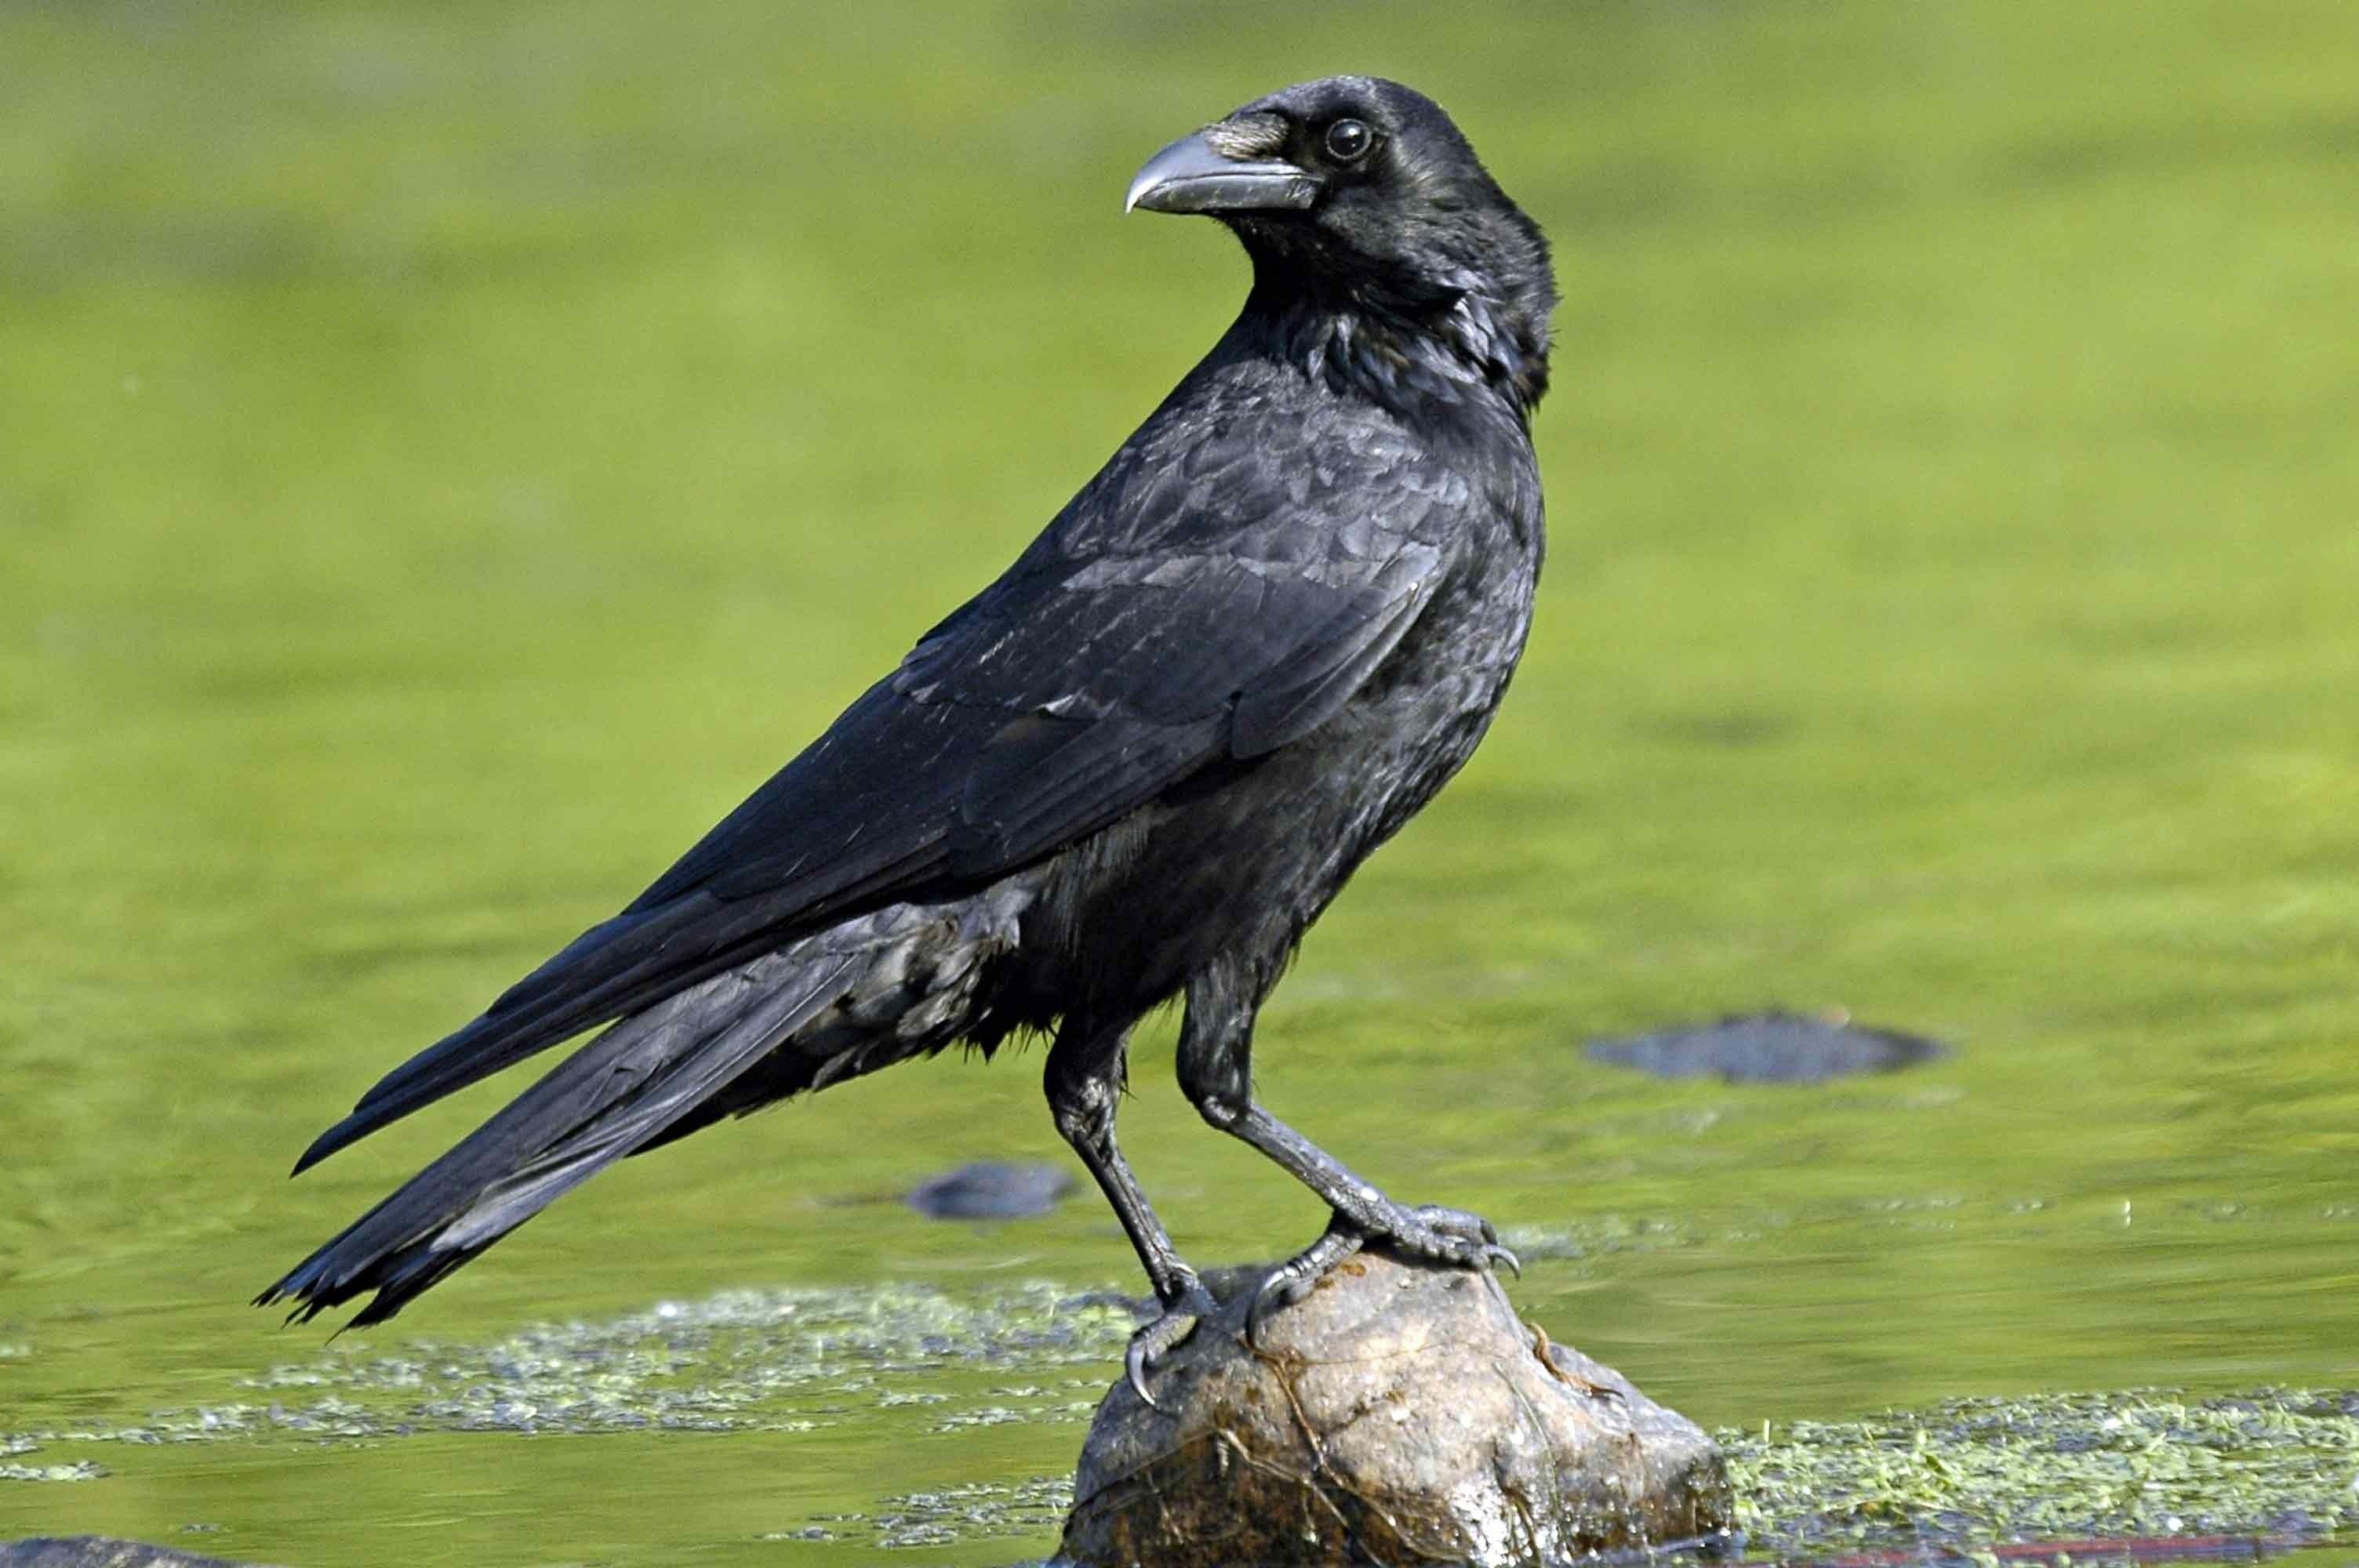 Birds Crow Wallpapers Free Beautiful Download Hd Desktop Images Crow Crow Images Crow Bird